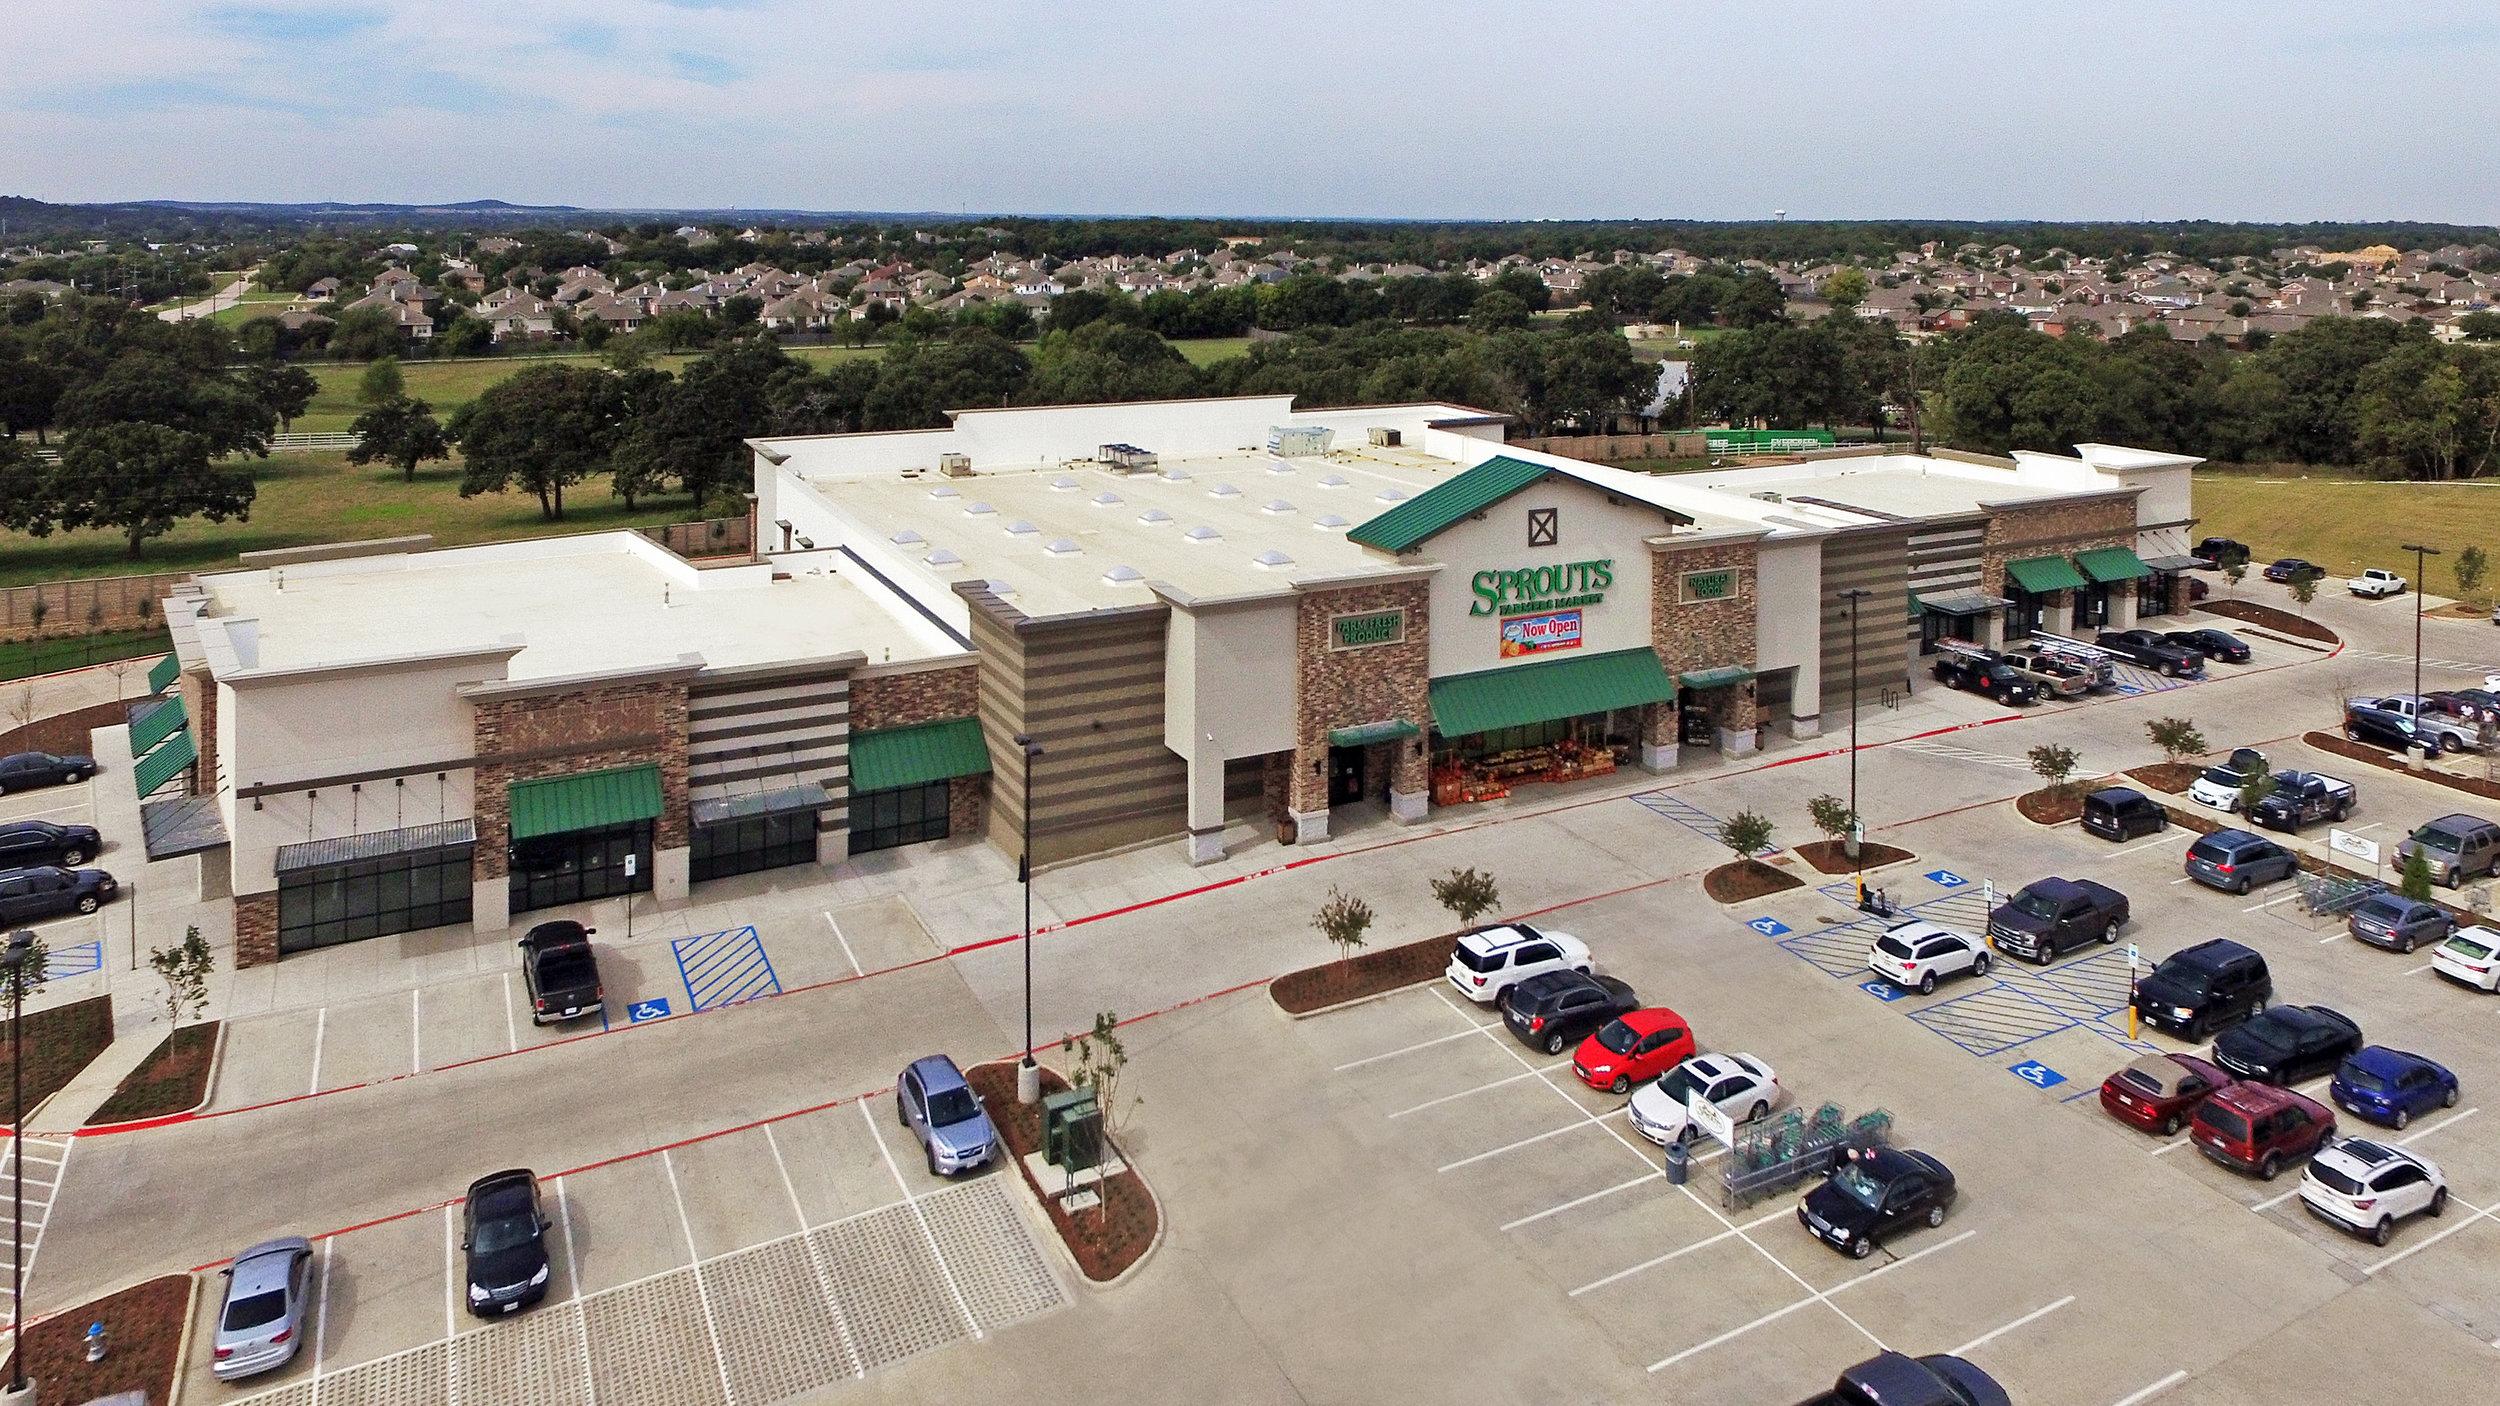 Sprouts Farmers Market, Denton, TX